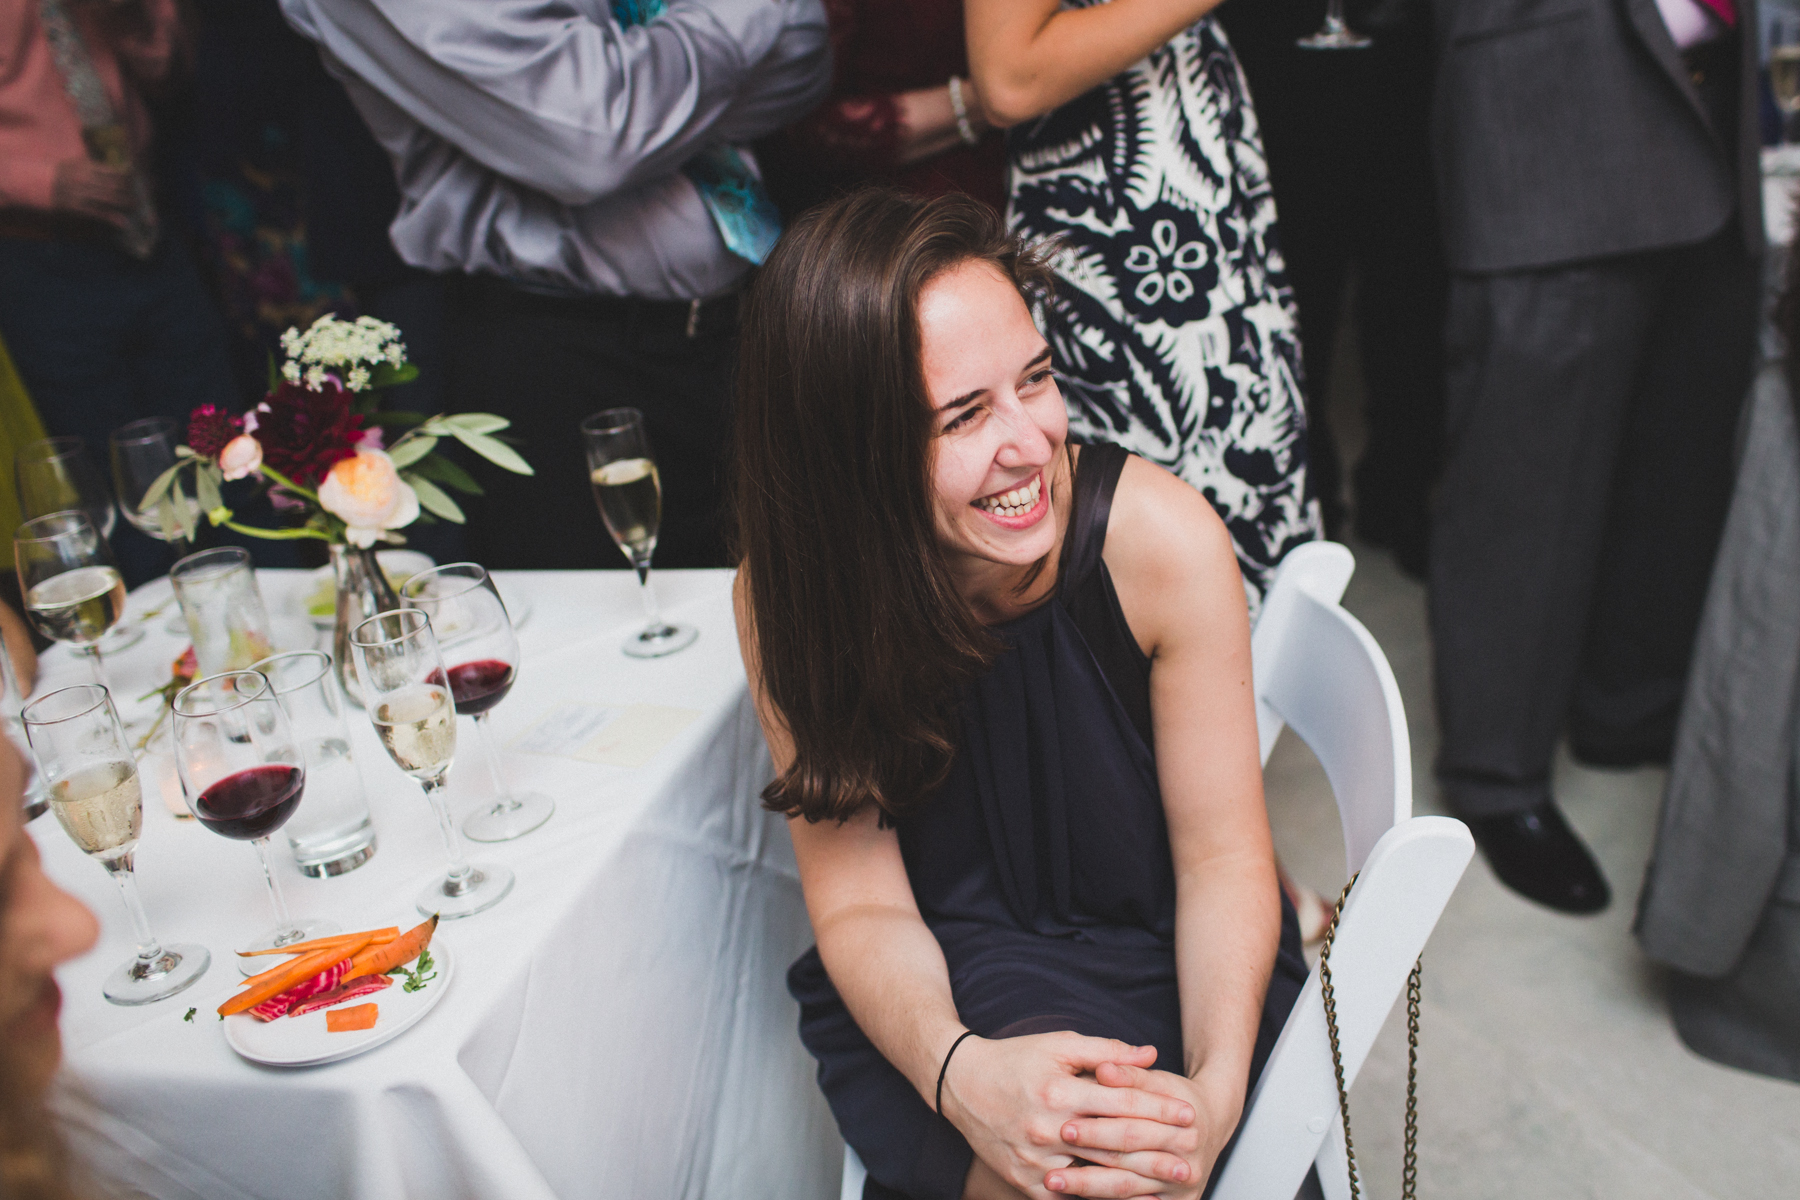 ICI-Restaurant-Fort-Greene-Brooklyn-Intimate-Documentary-Wedding-Photography-Elvira-Kalviste-81.jpg